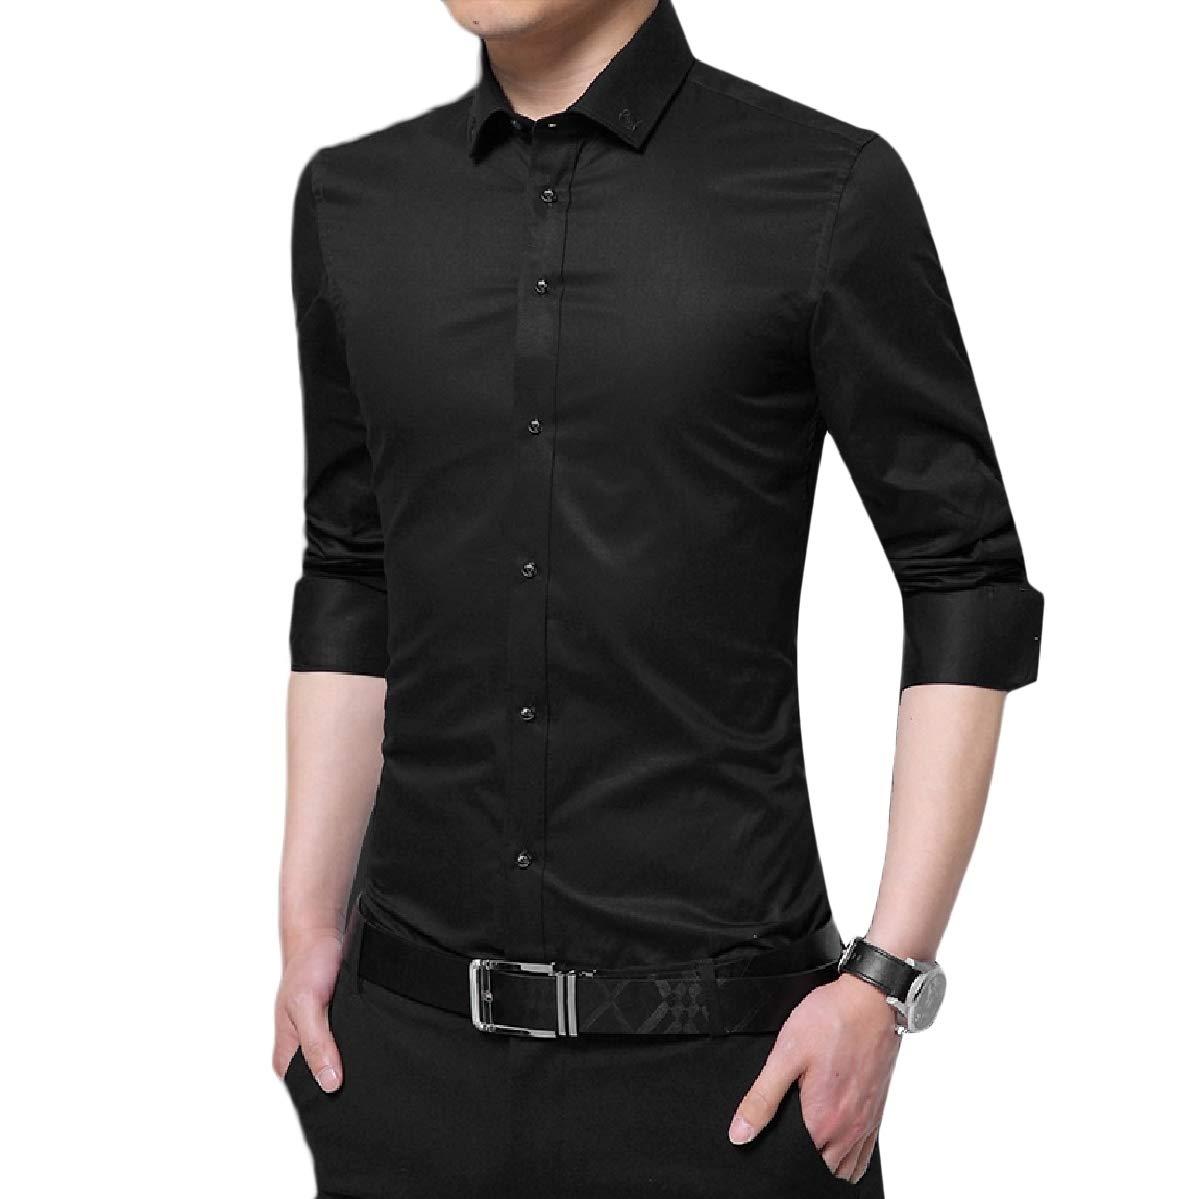 Mfasica Men Non-Iron Regular Solid Slim Fit Cheap Long Sleeve Shirts